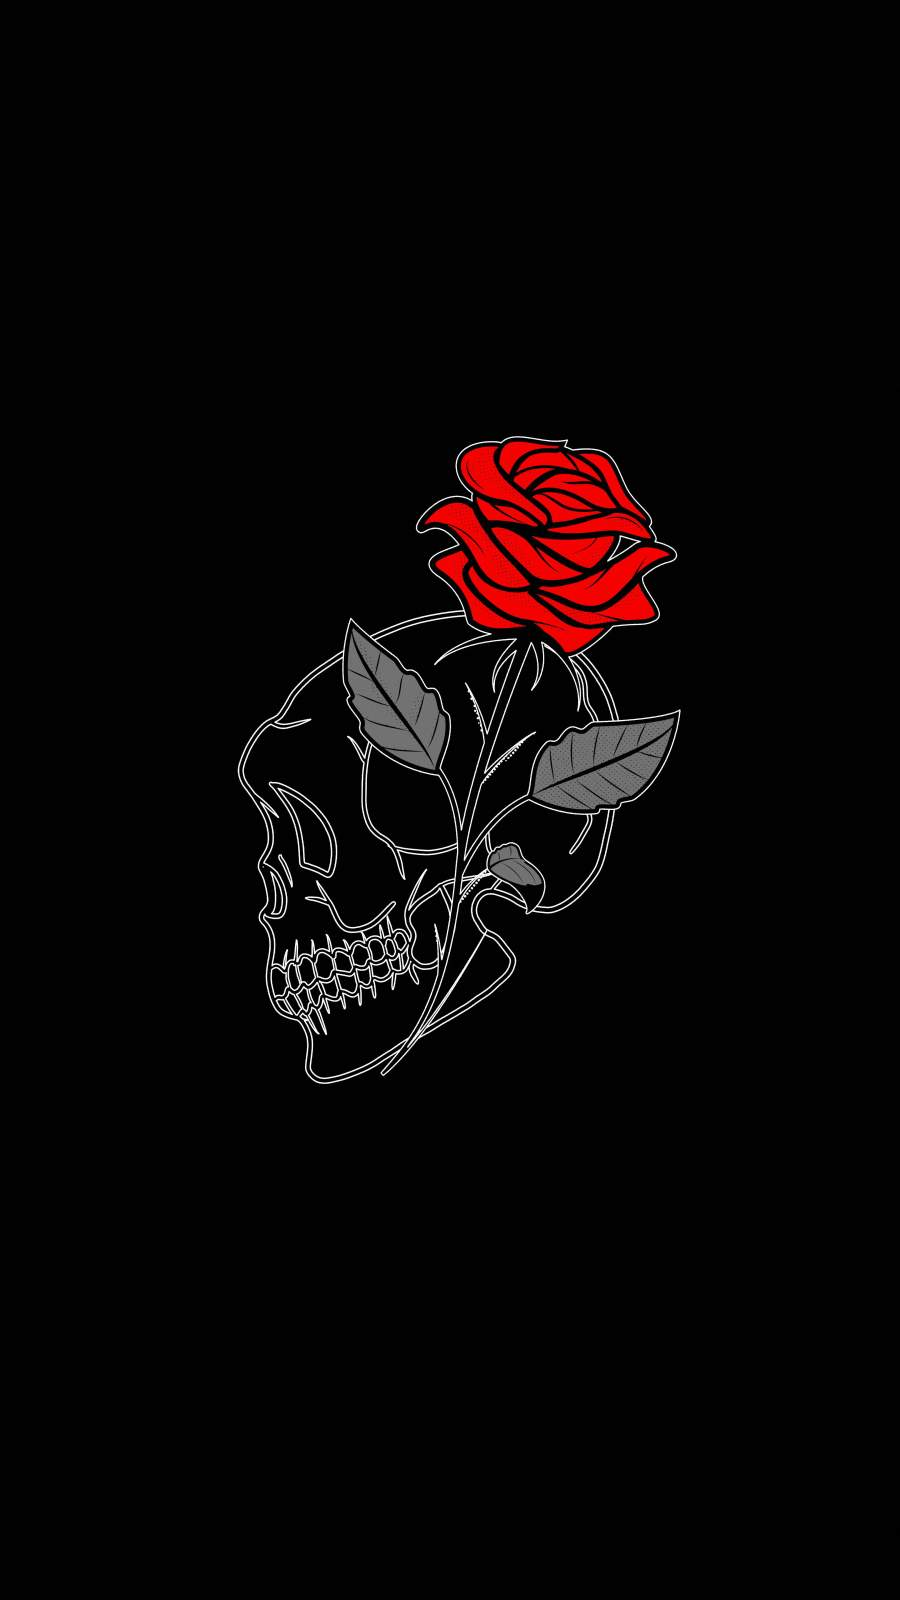 Rose Skull iPhone Wallpaper